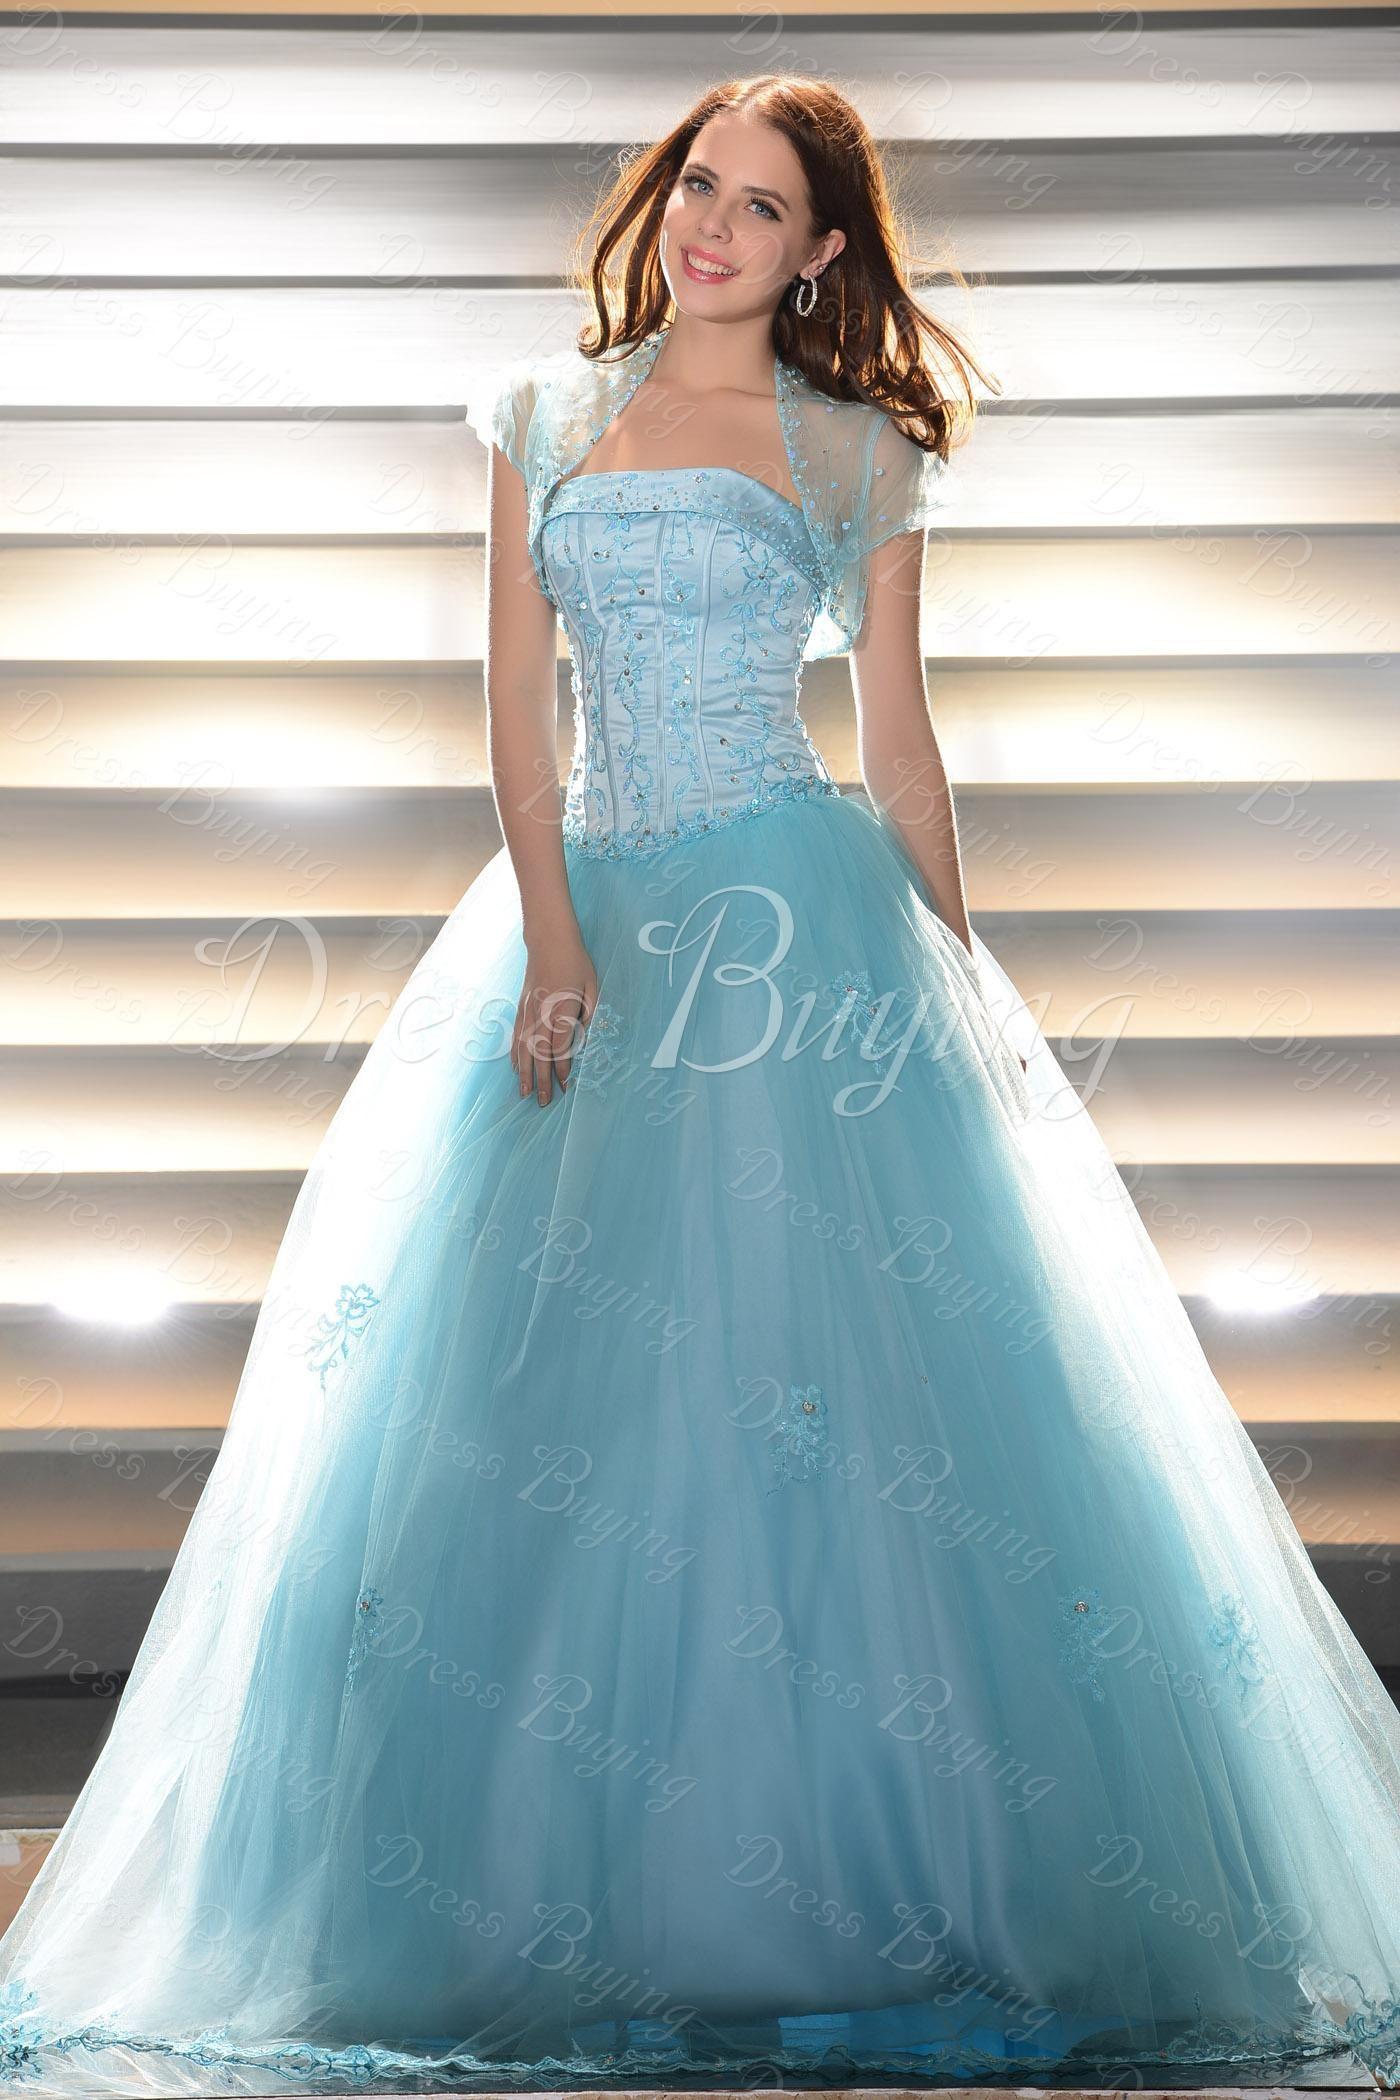 Fancy Ball Gown Quinceanera Dress $185.99 | ladies tea- formal ball ...